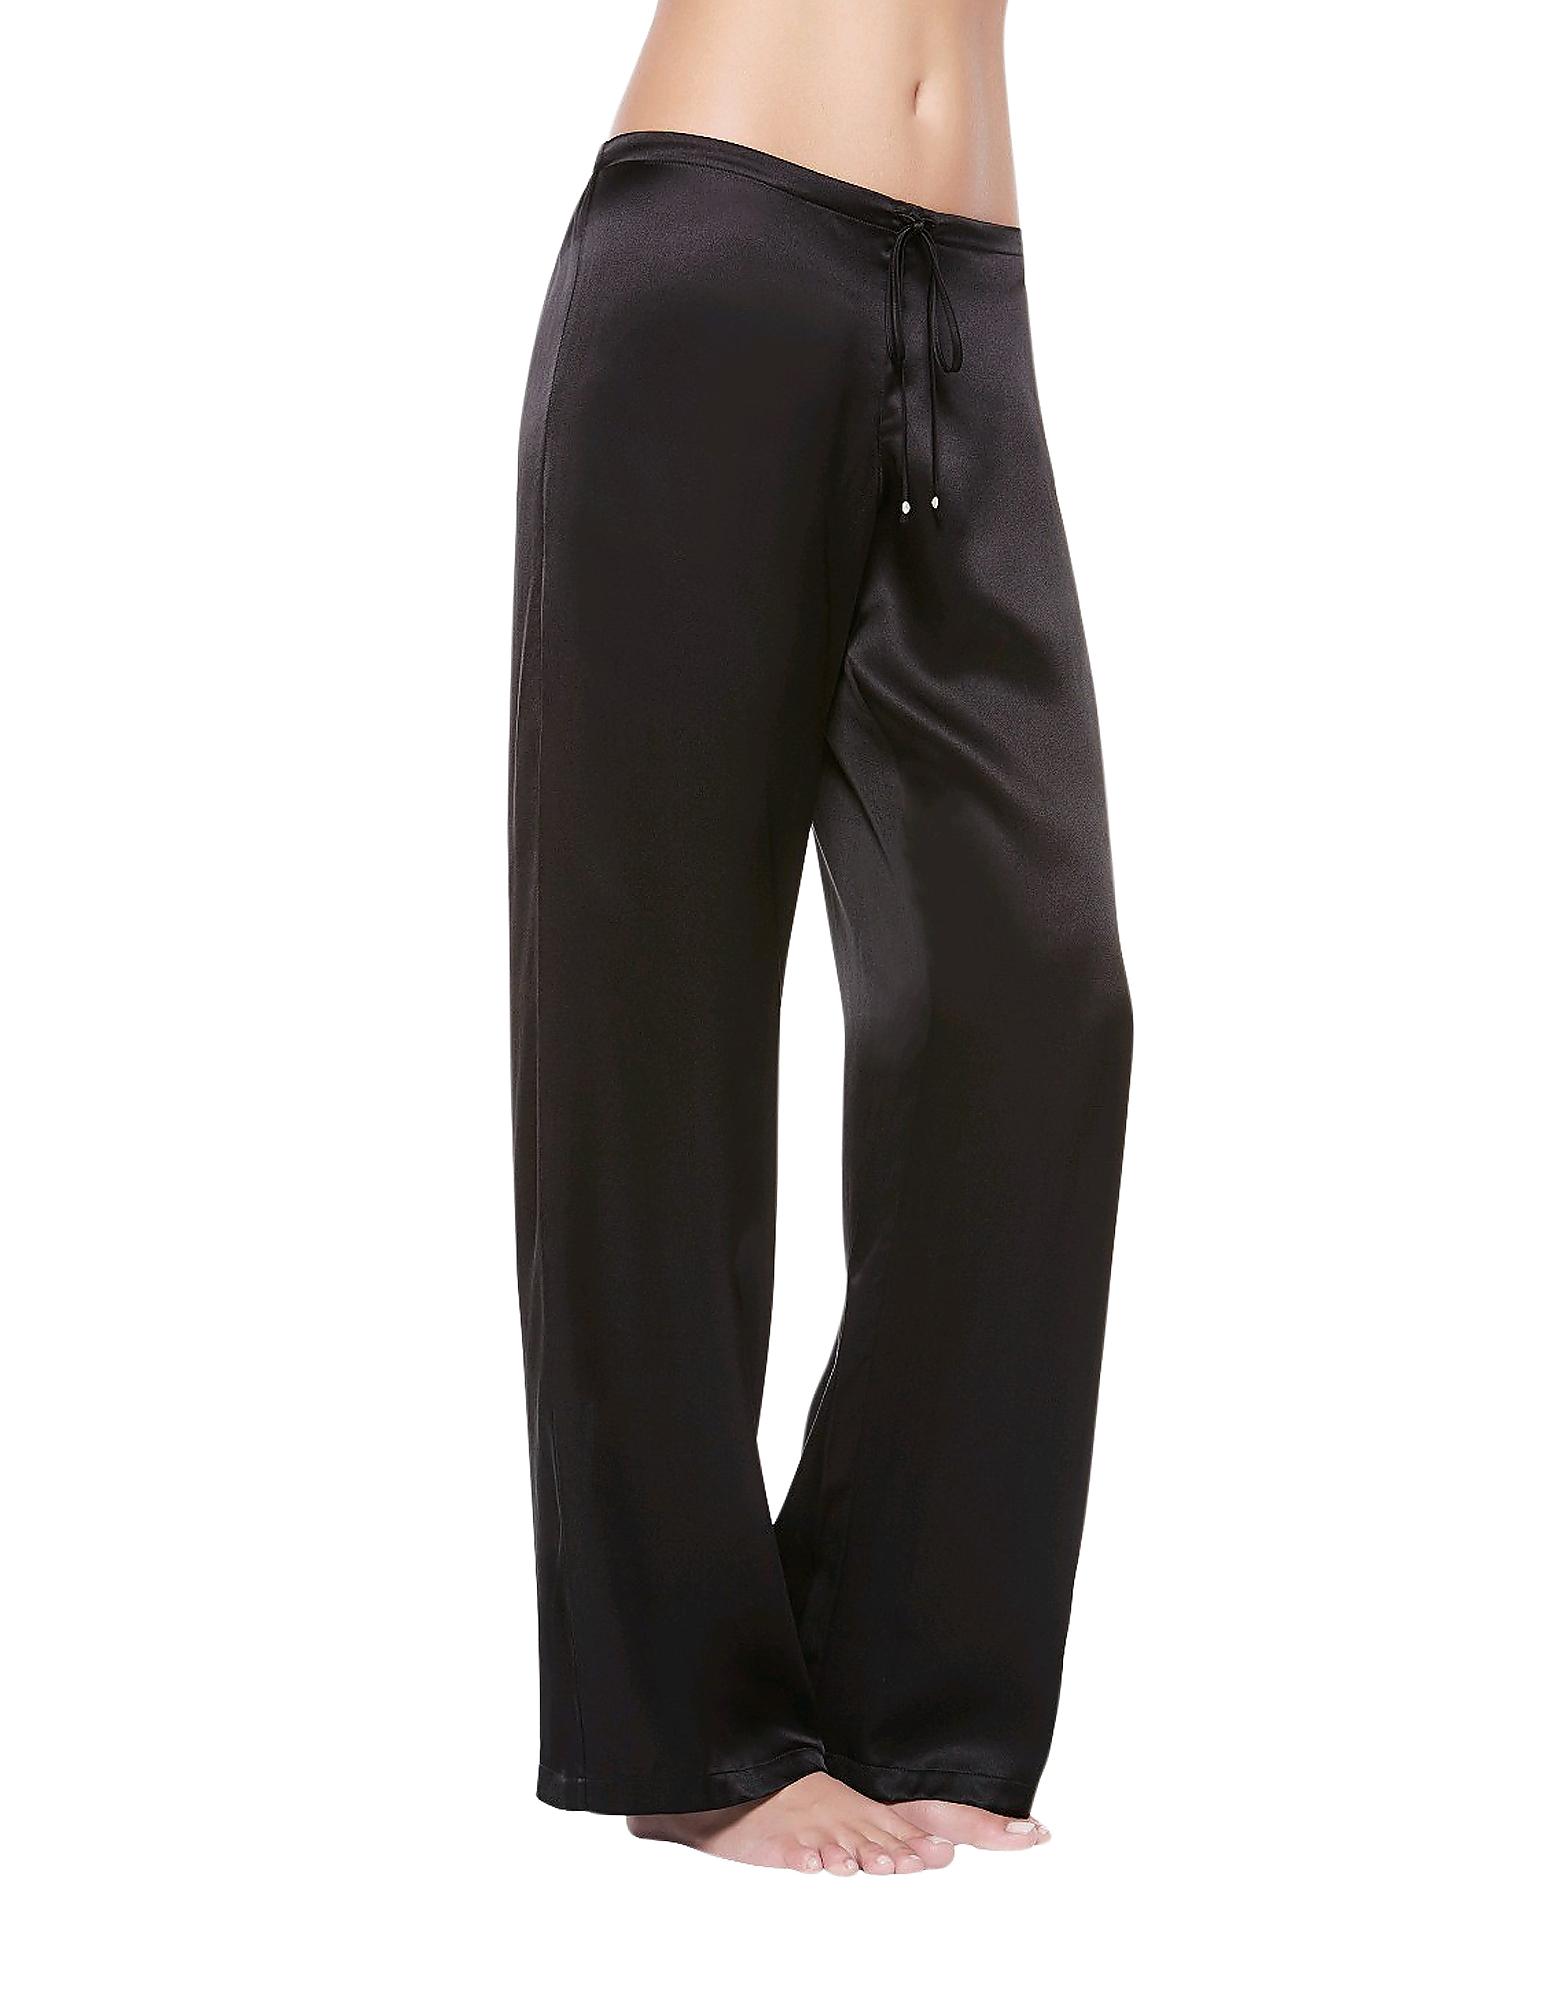 Petit Macrame Black Satin Silk Classic Trousers